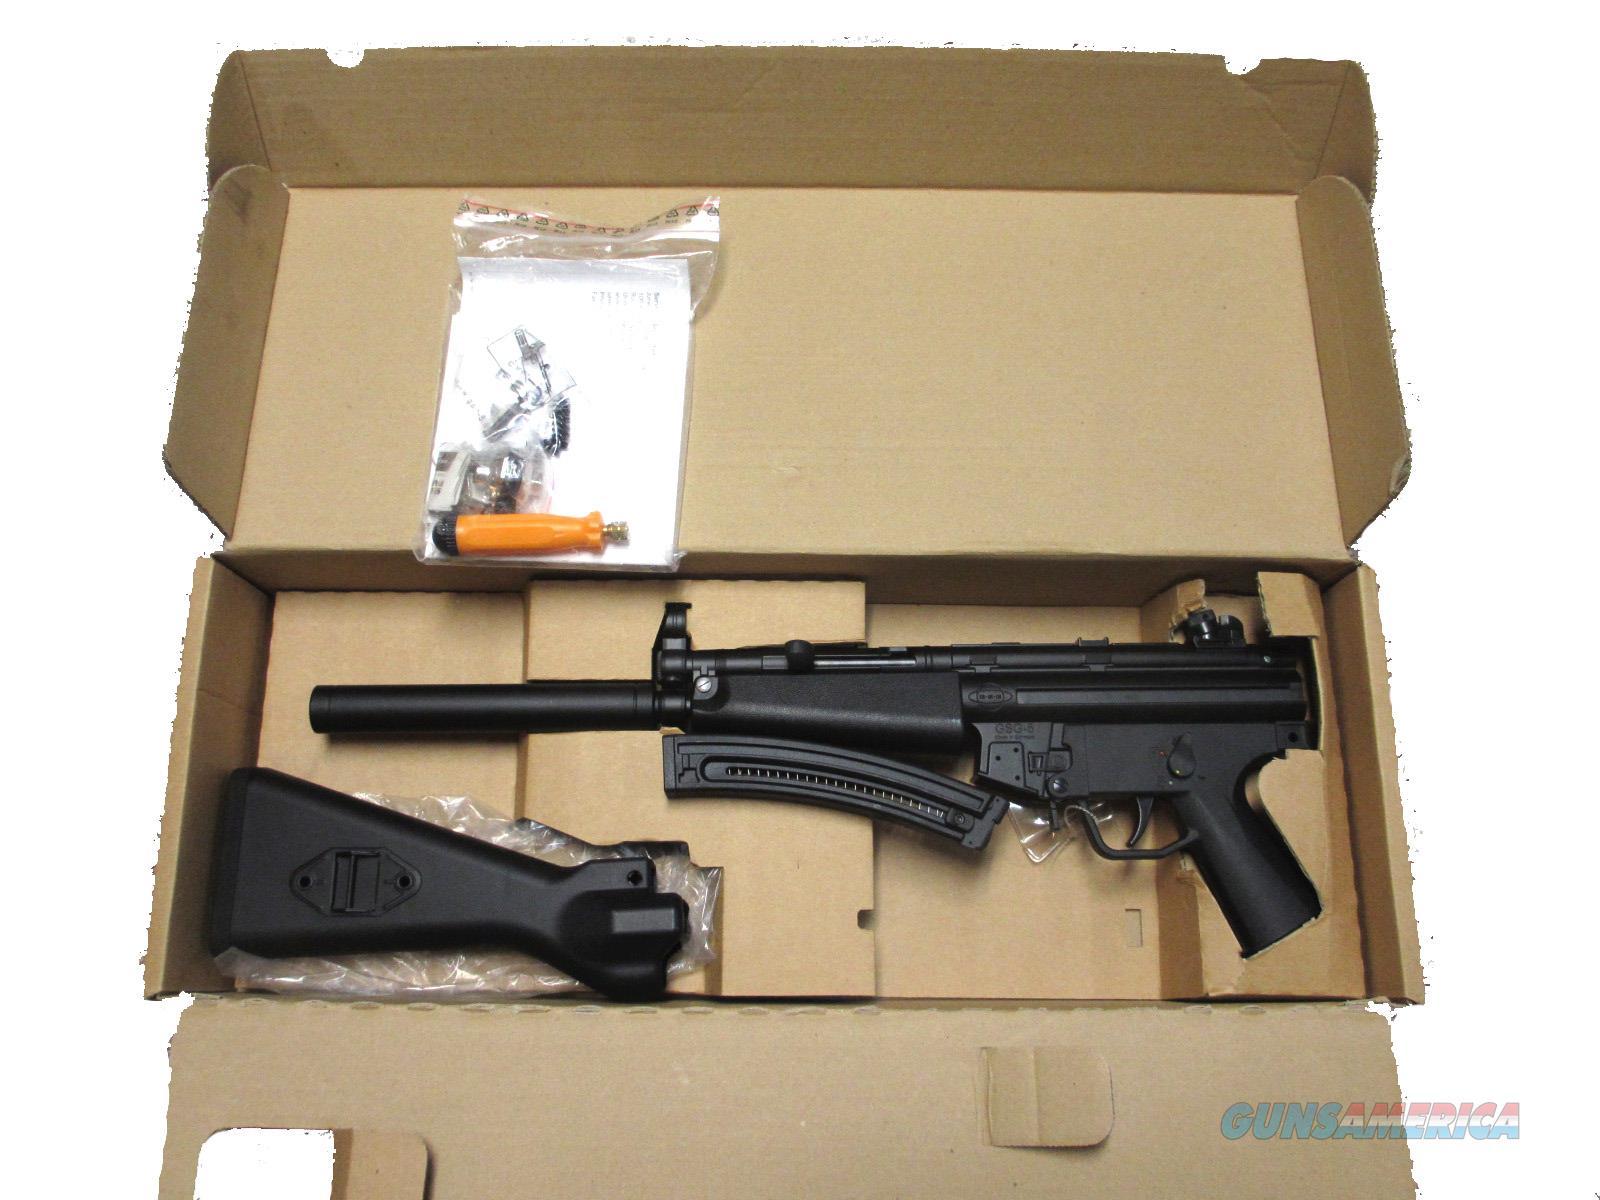 ATI GSG-522 HK  22LR MP5 Clone Original model from 2008 NIB UPC:  892756002007 MODEL: GERG2222MP5